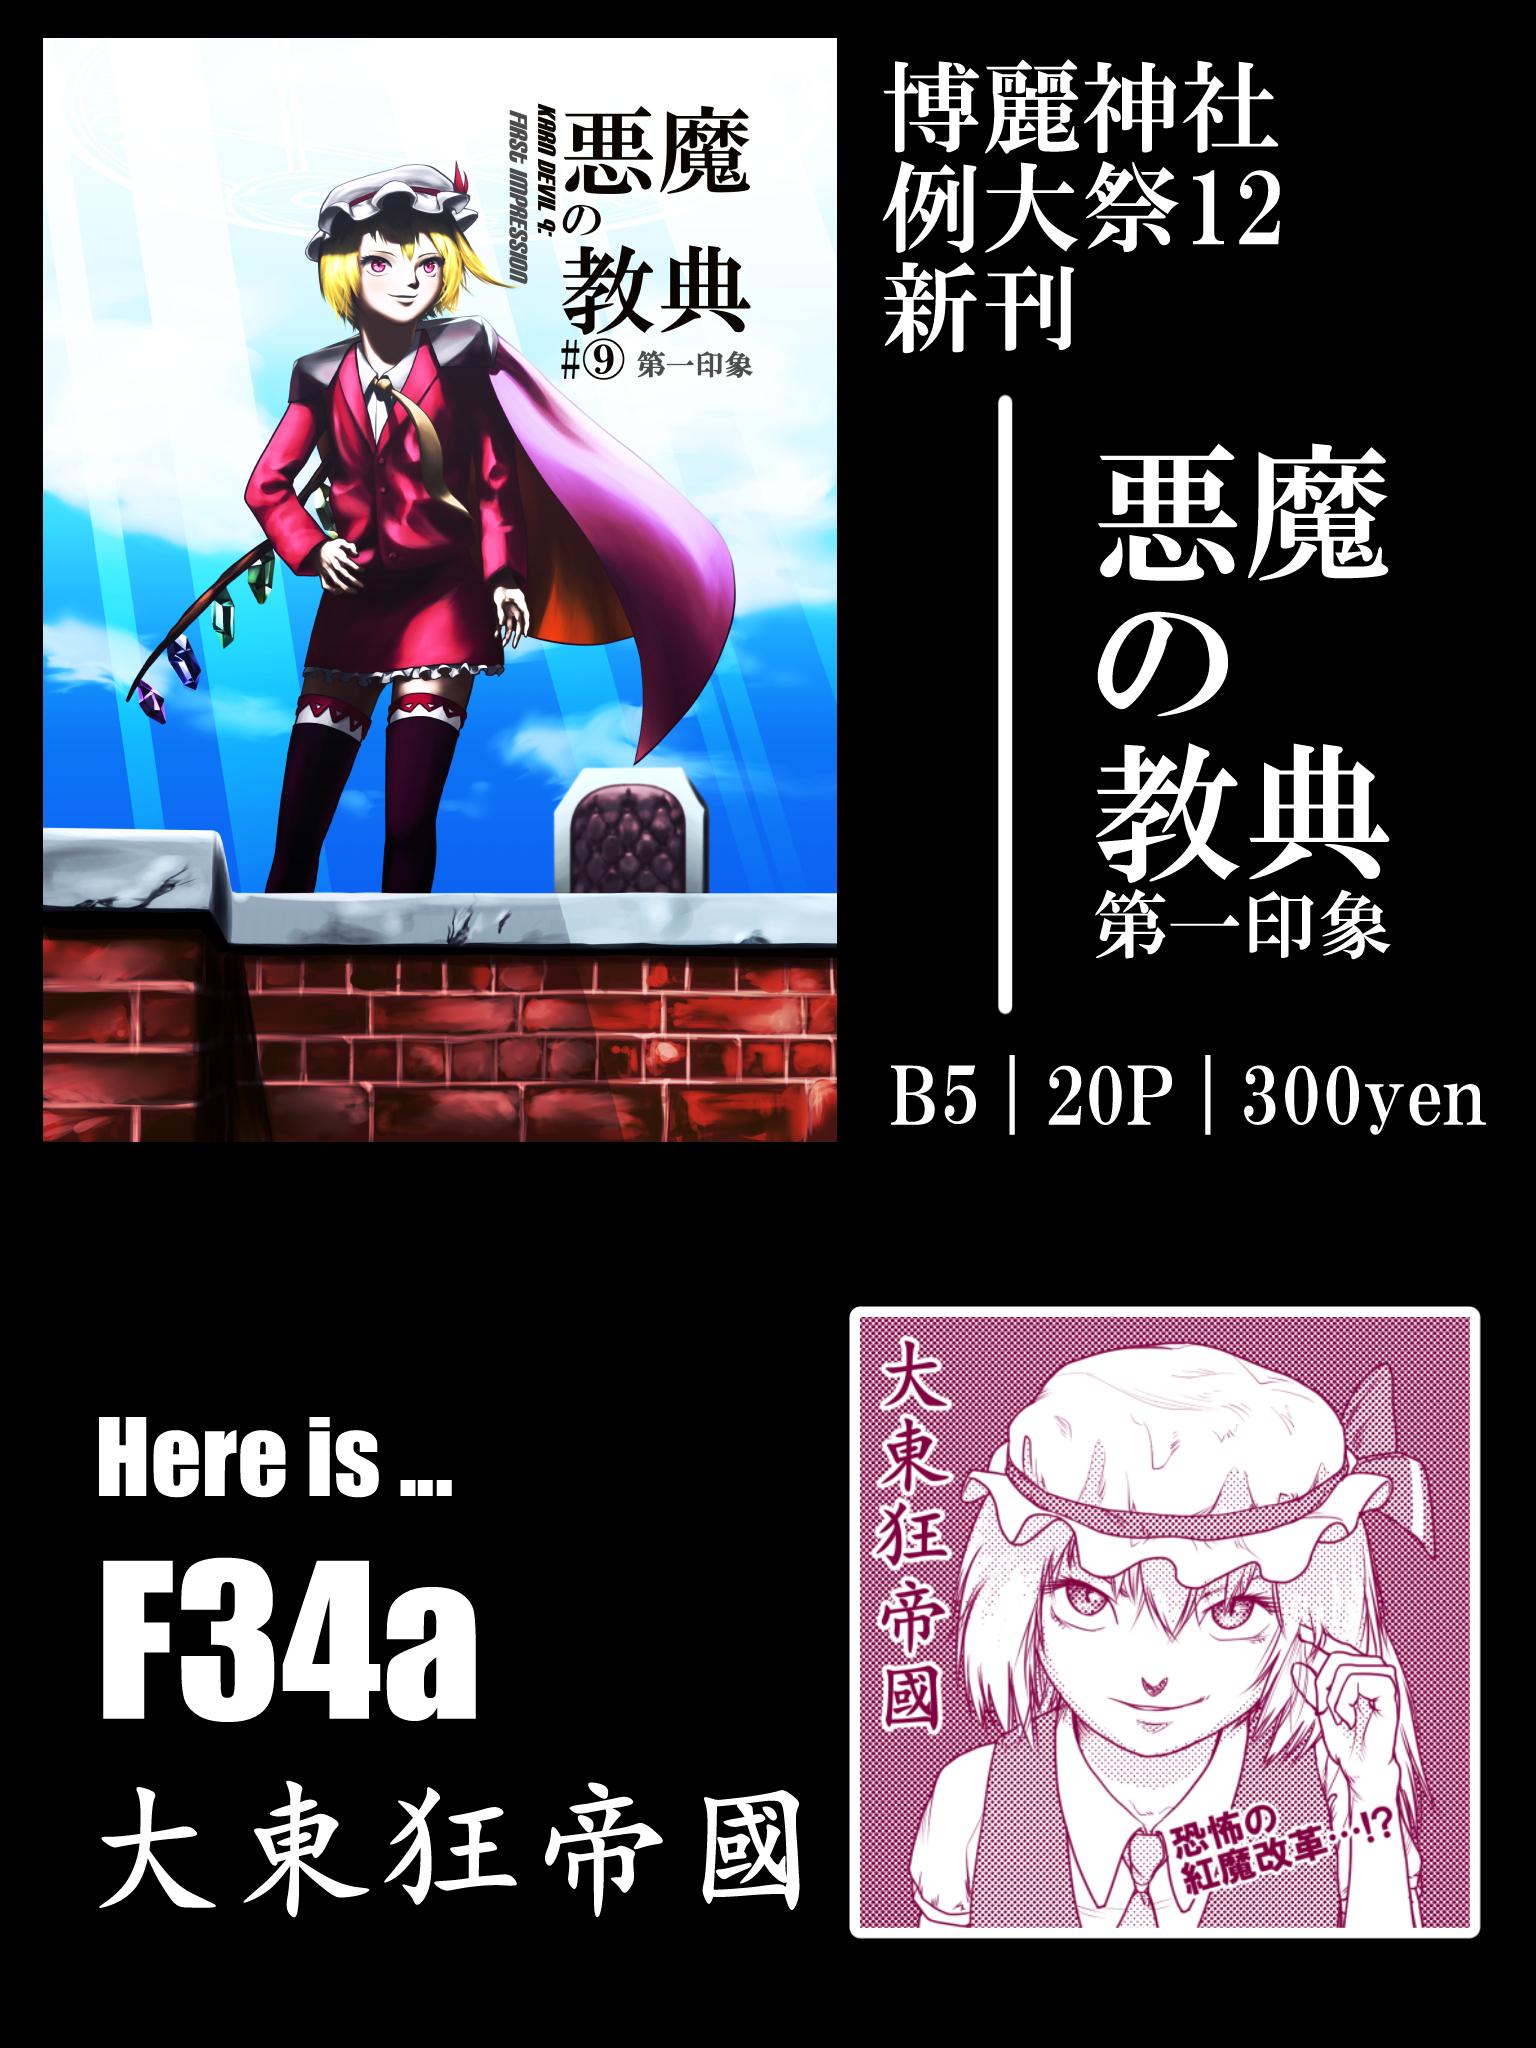 Display_例大祭12_01